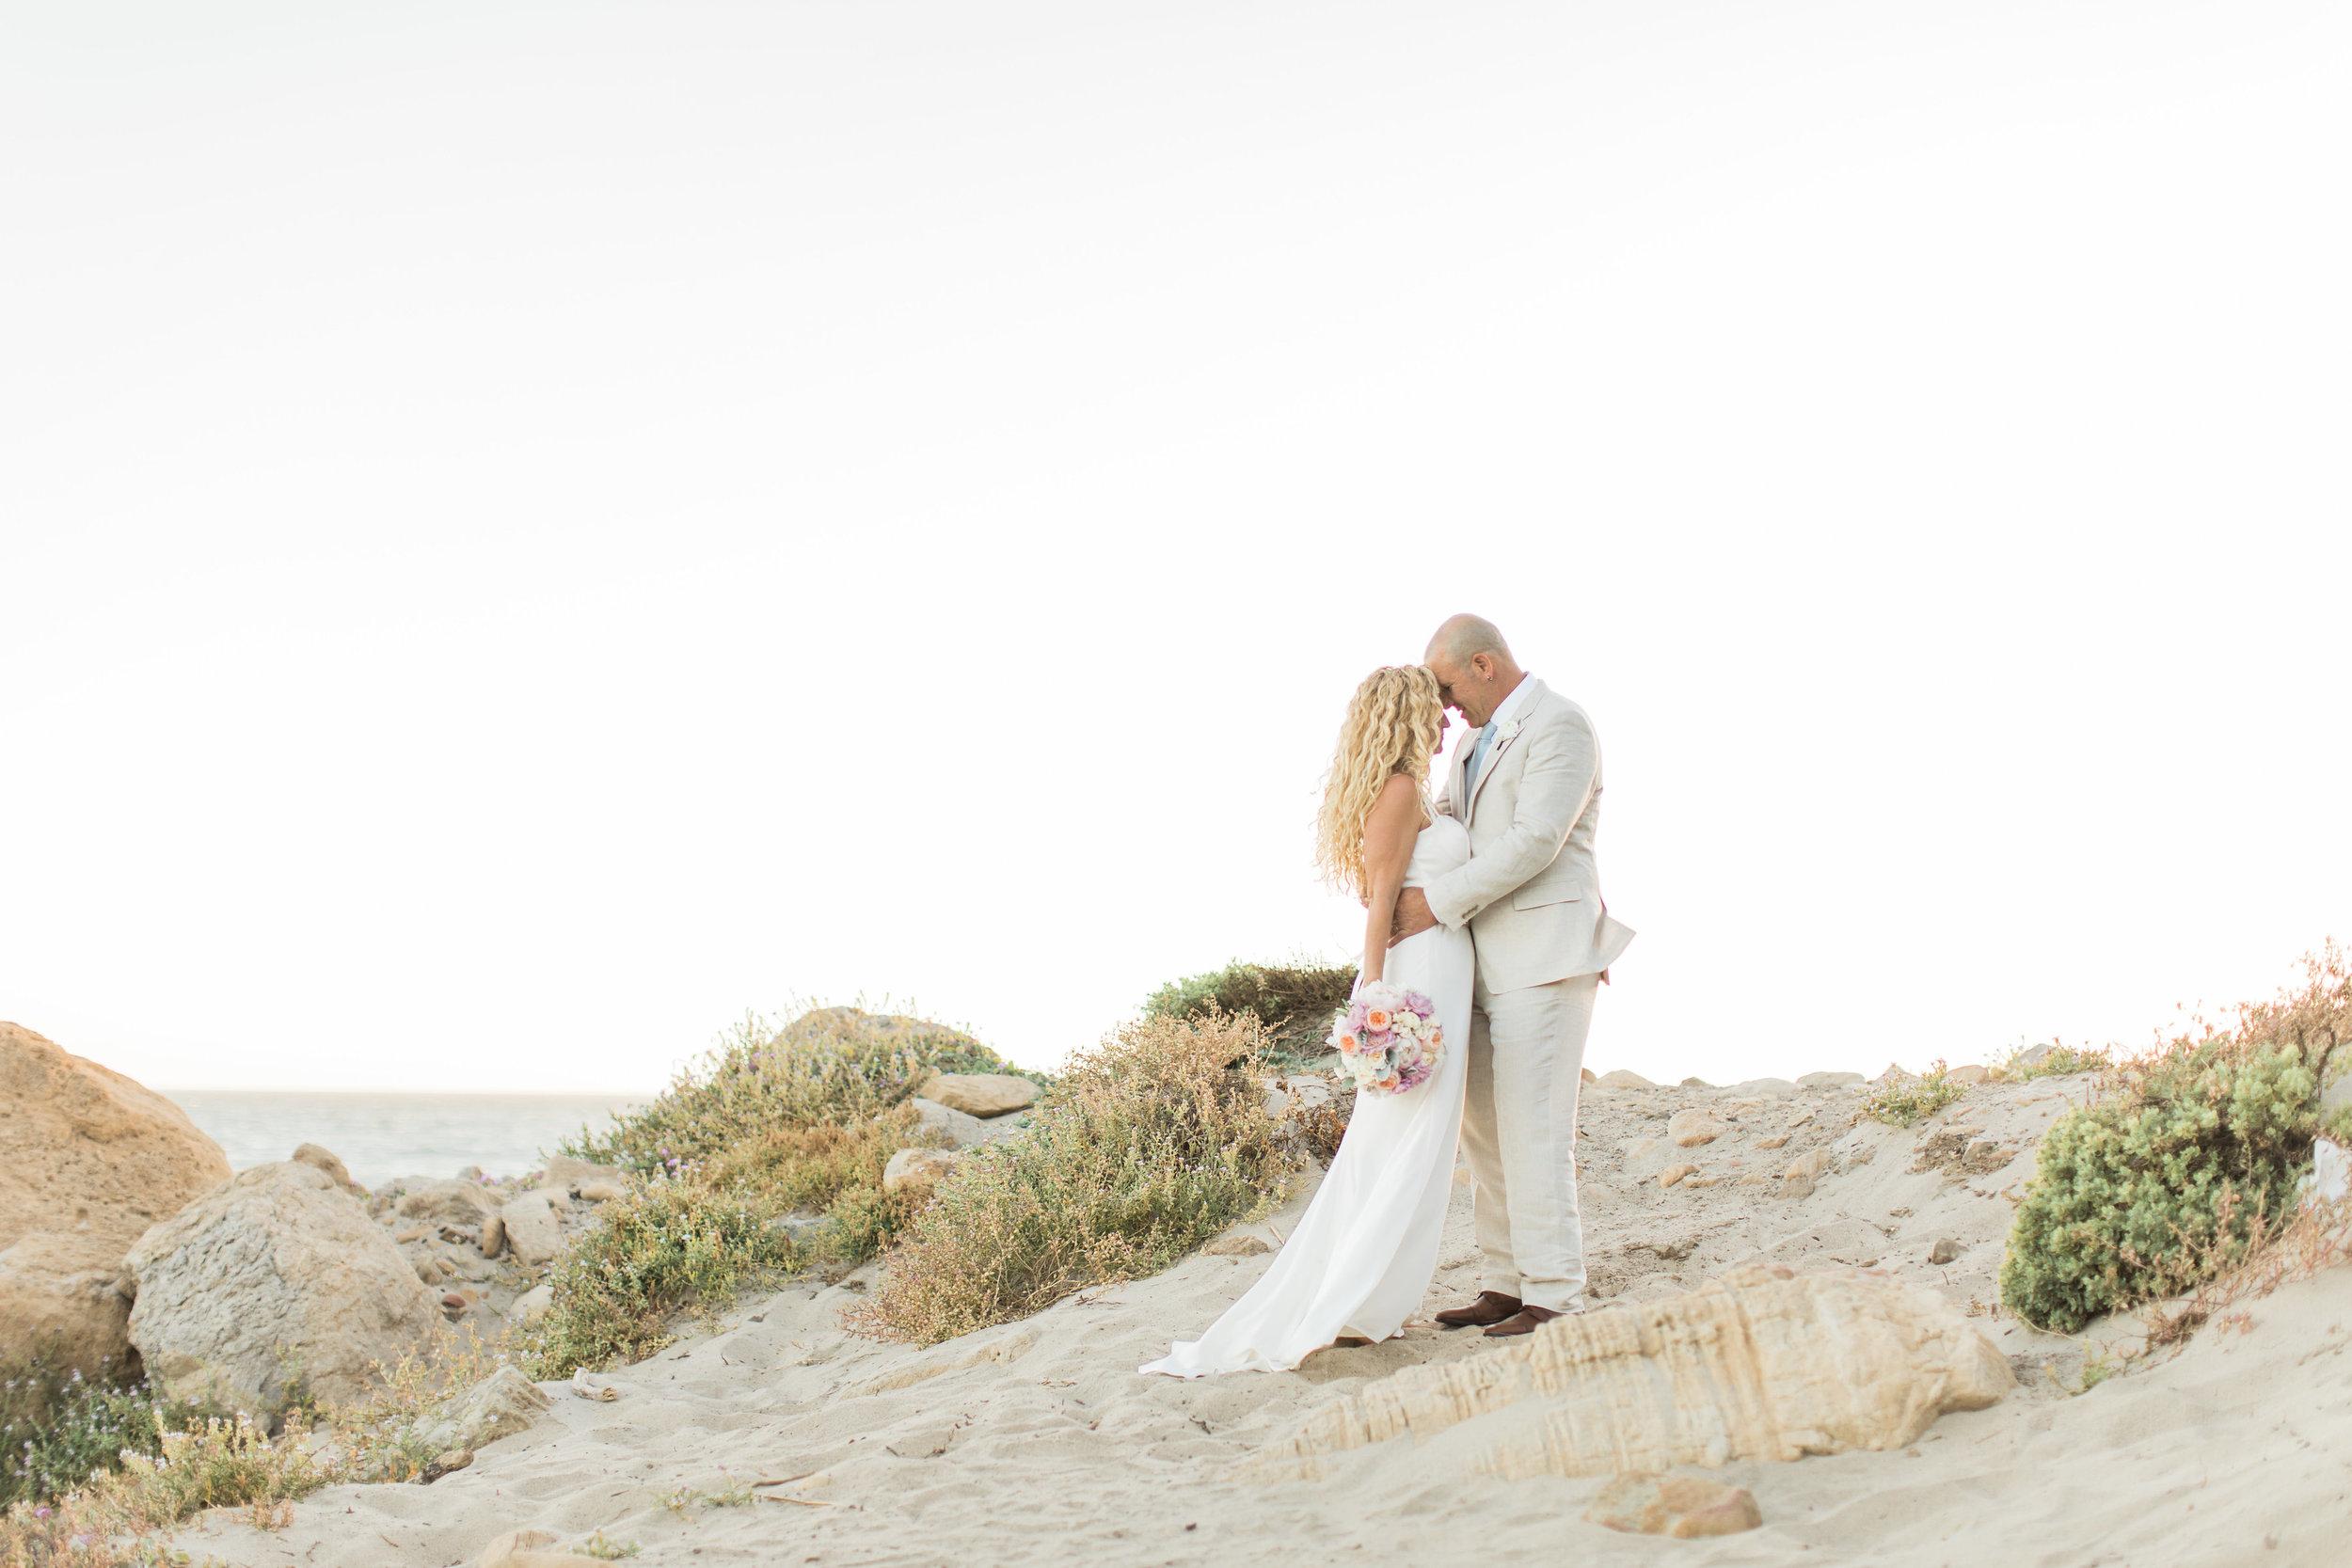 Jenny Quicksall Photography_www.jennyquicksall.com_Malibu Private Estate Wedding_Malibu California_ (32).jpg